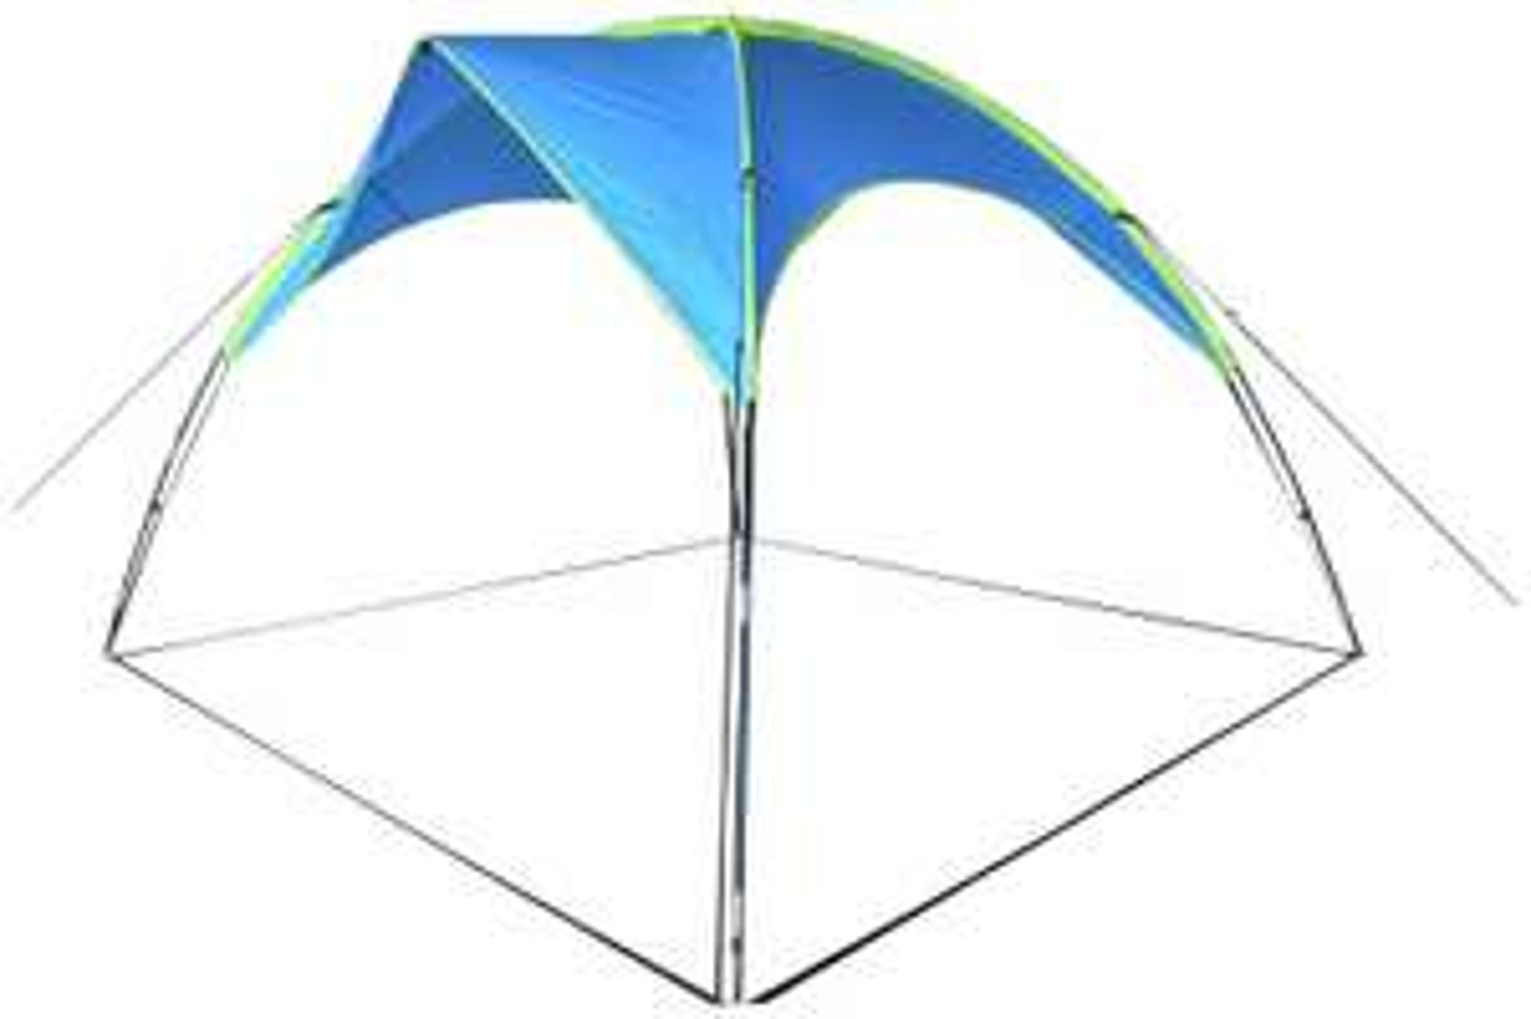 Trespass Mini Event Shelter - Blue £11.99 delivered (UK Mainland) @ Argos / ebay